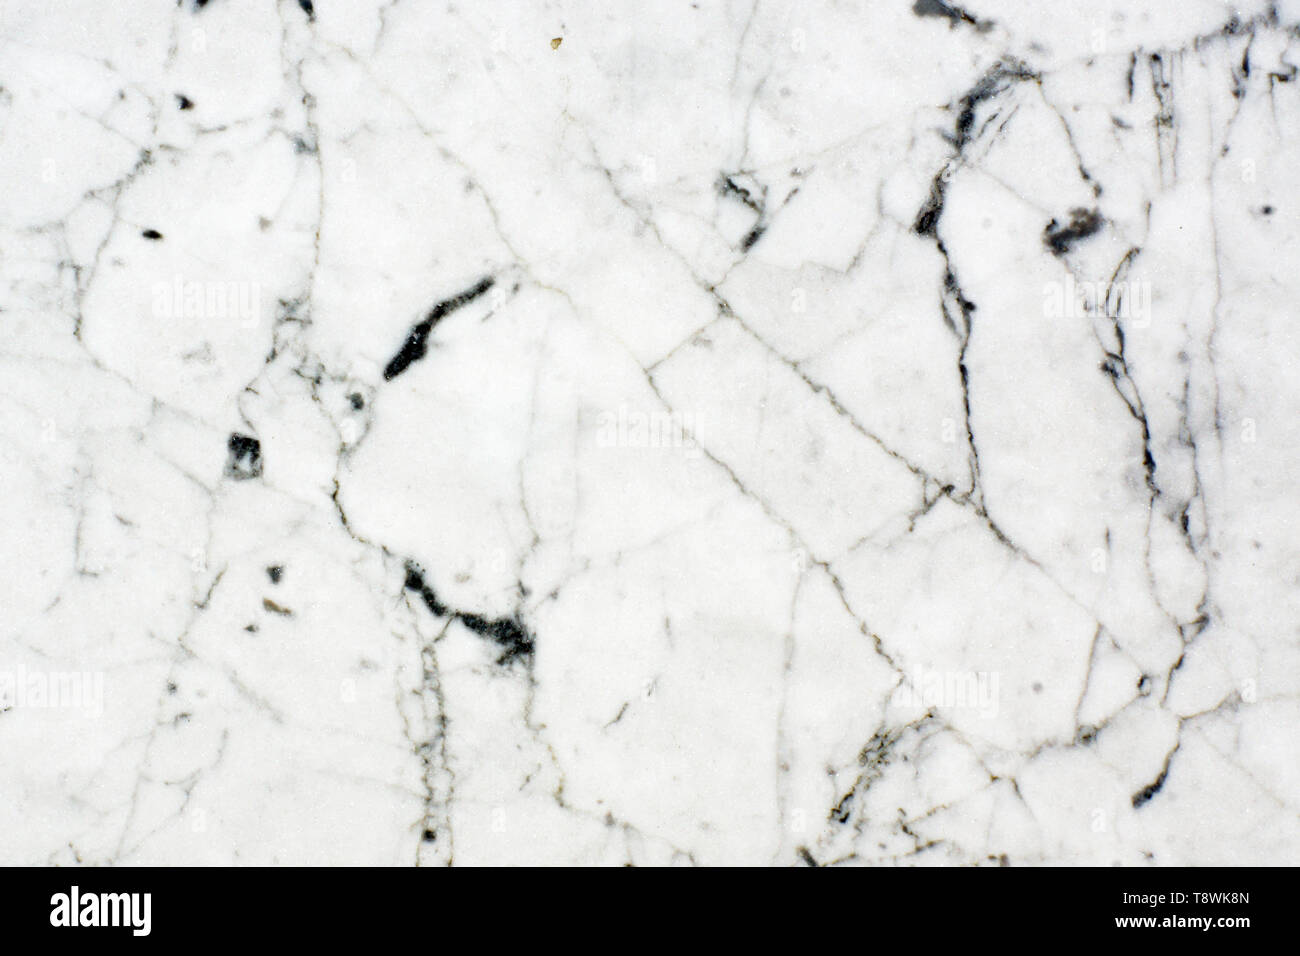 White natural stone, dark veined marble texture. - Stock Image